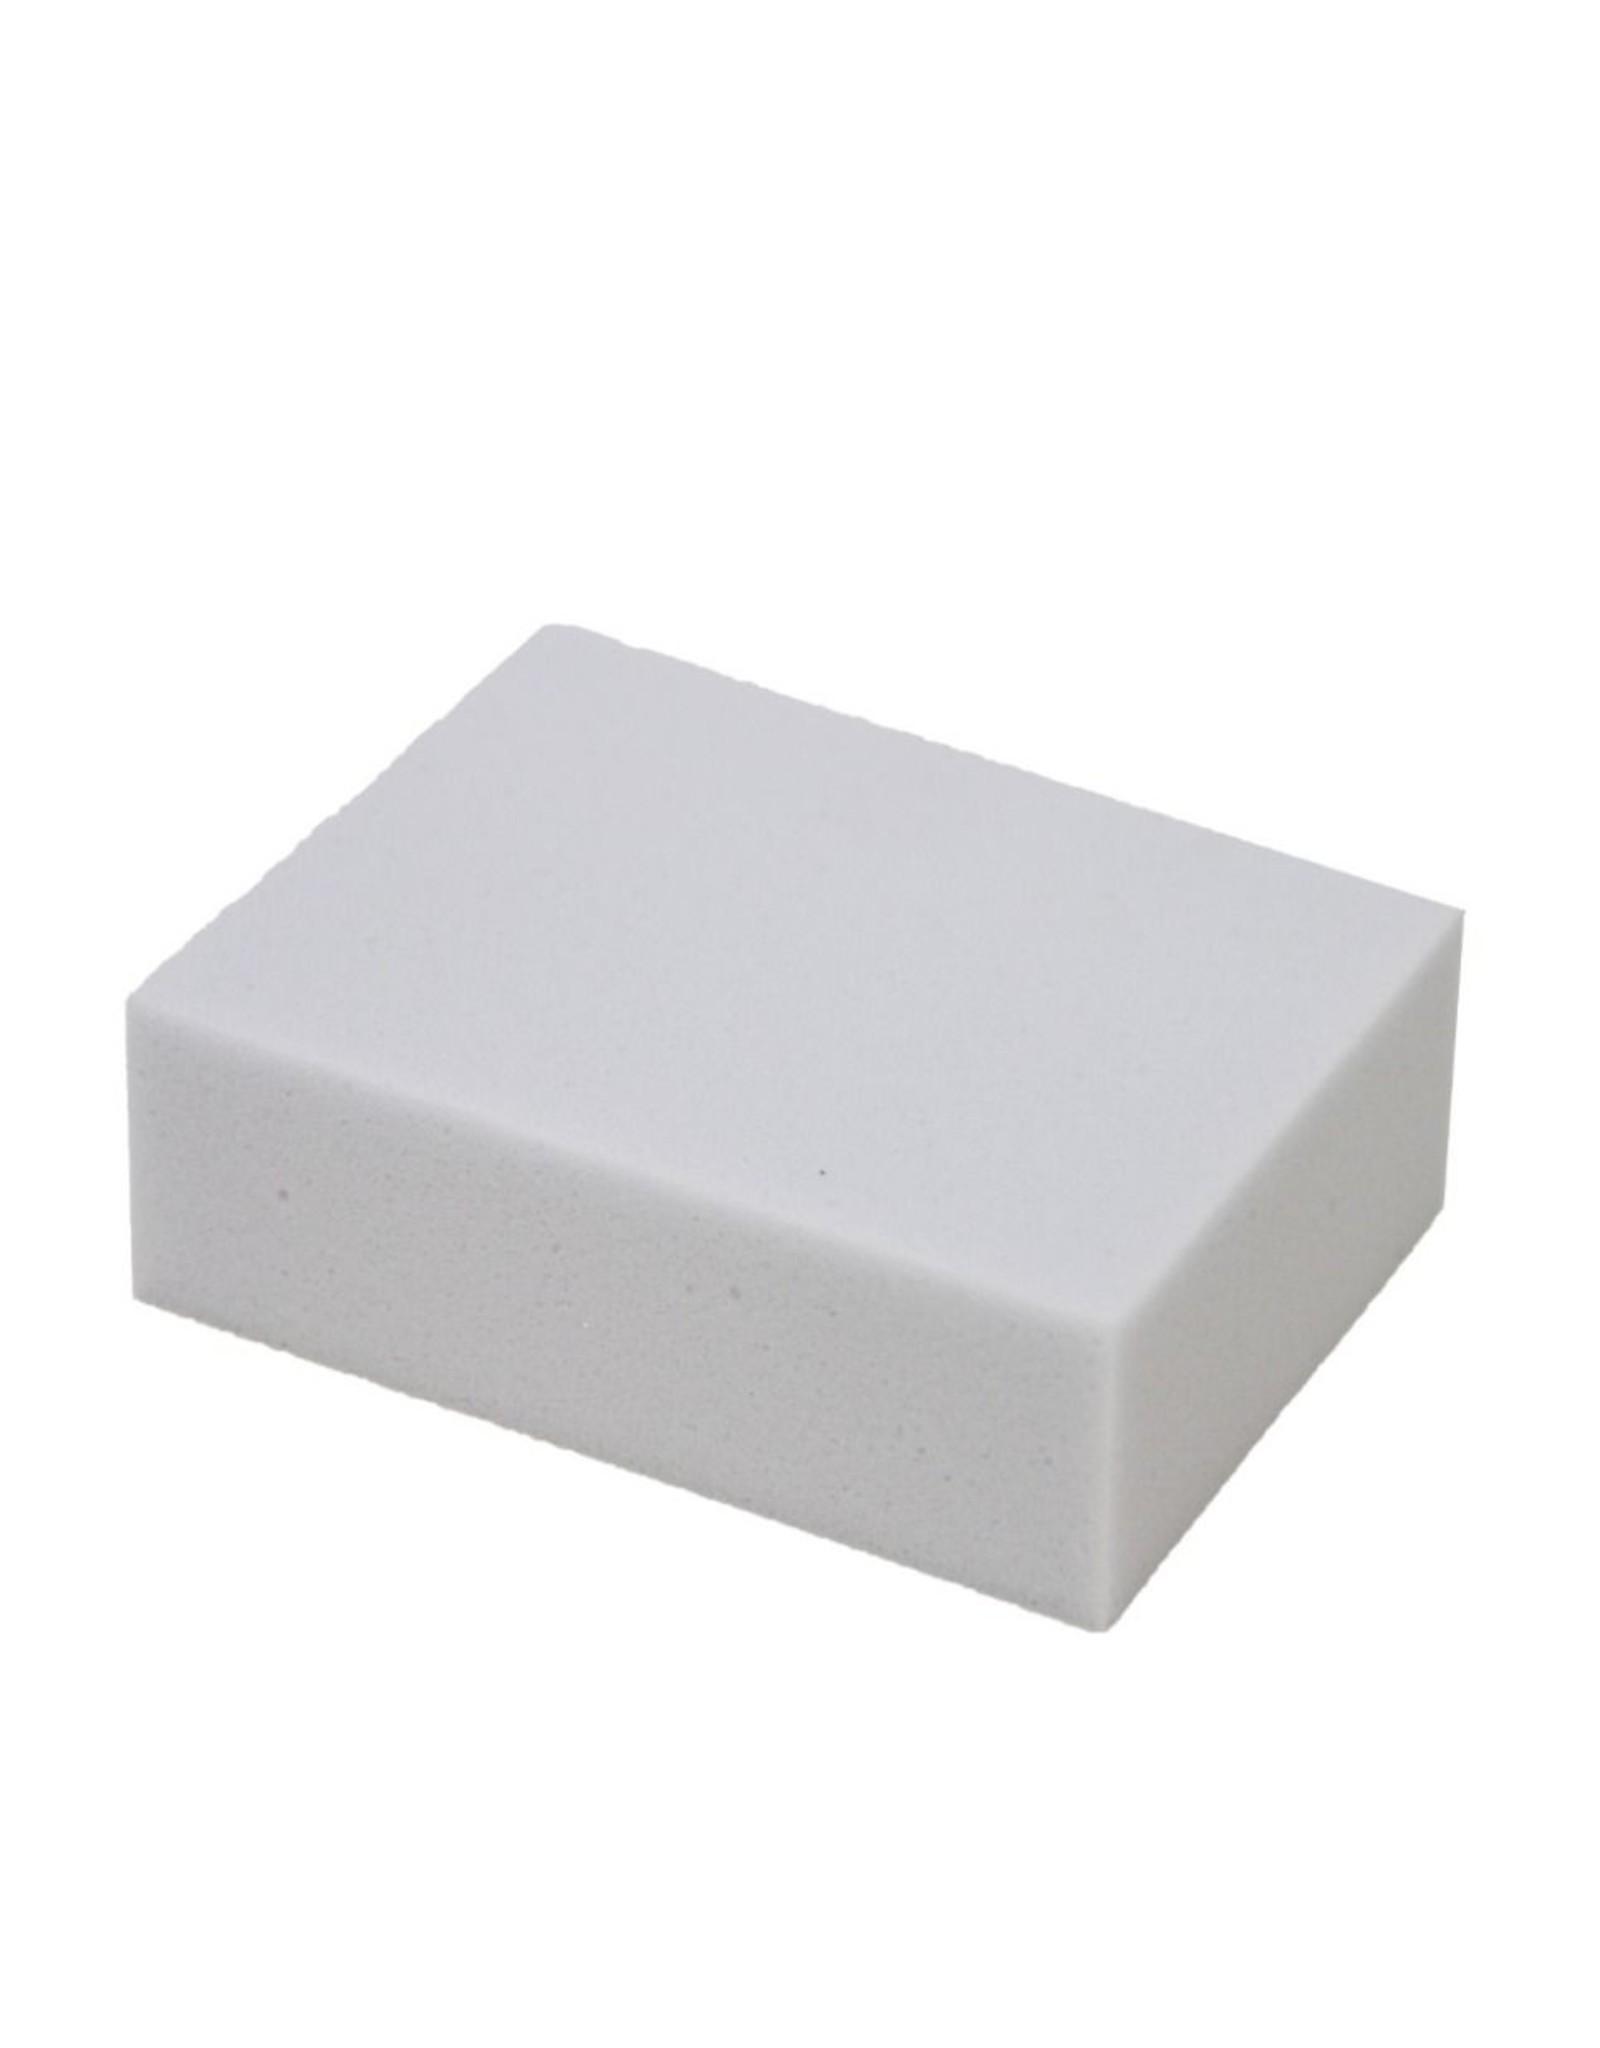 ACOR Melamine spons  10 stuks grijs 11.2x8.2x4 cm.